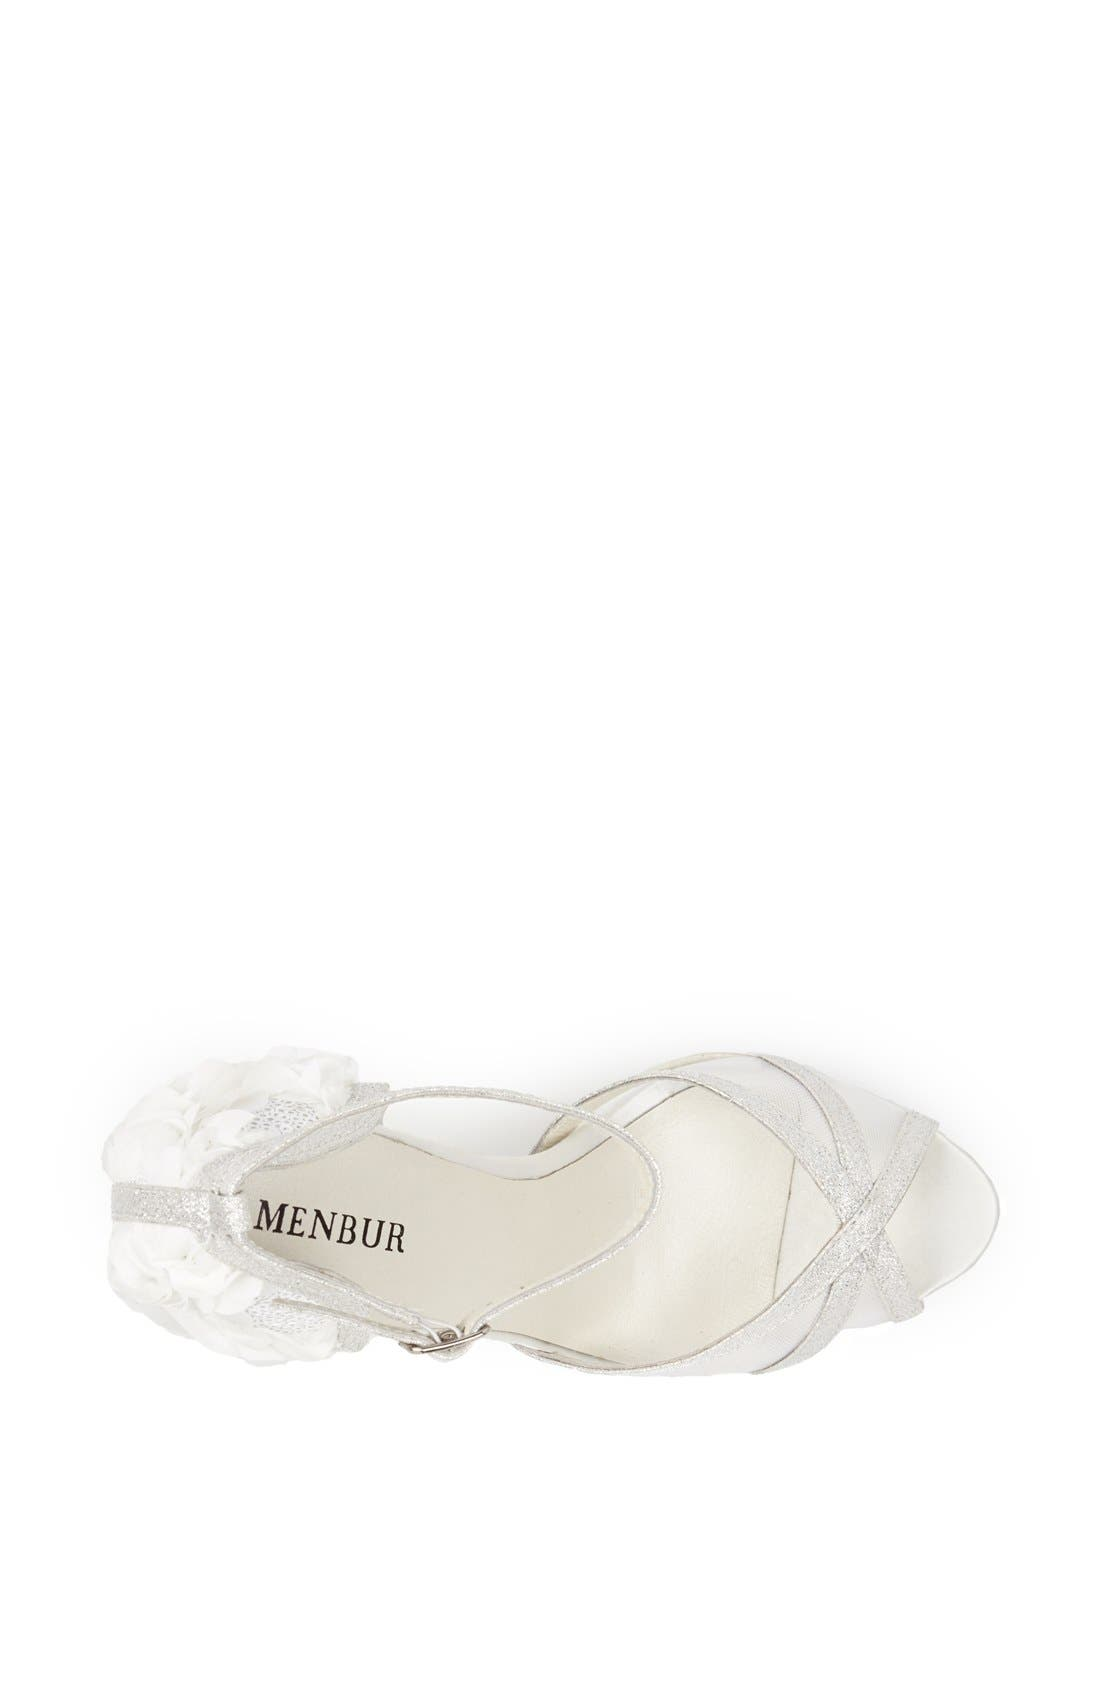 Alternate Image 3  - Menbur 'Iria' Satin Sandal